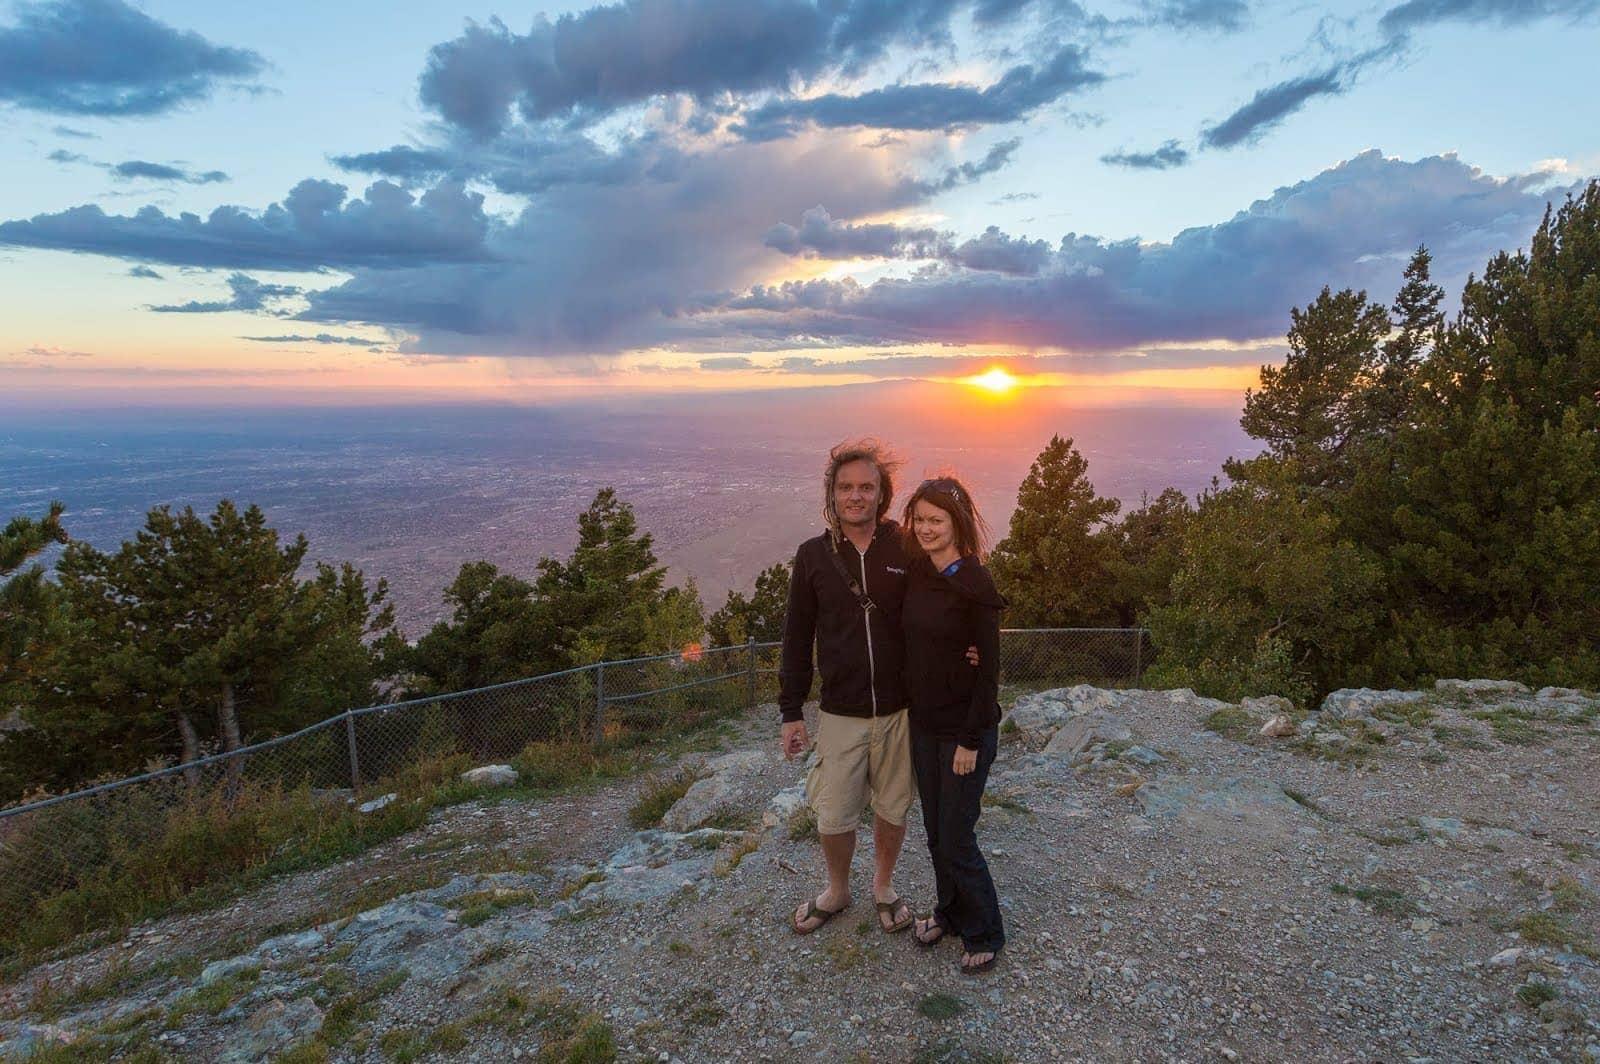 Sandia Peak Sunset Albuquerque New Mexico_by_Laurence Norah-4